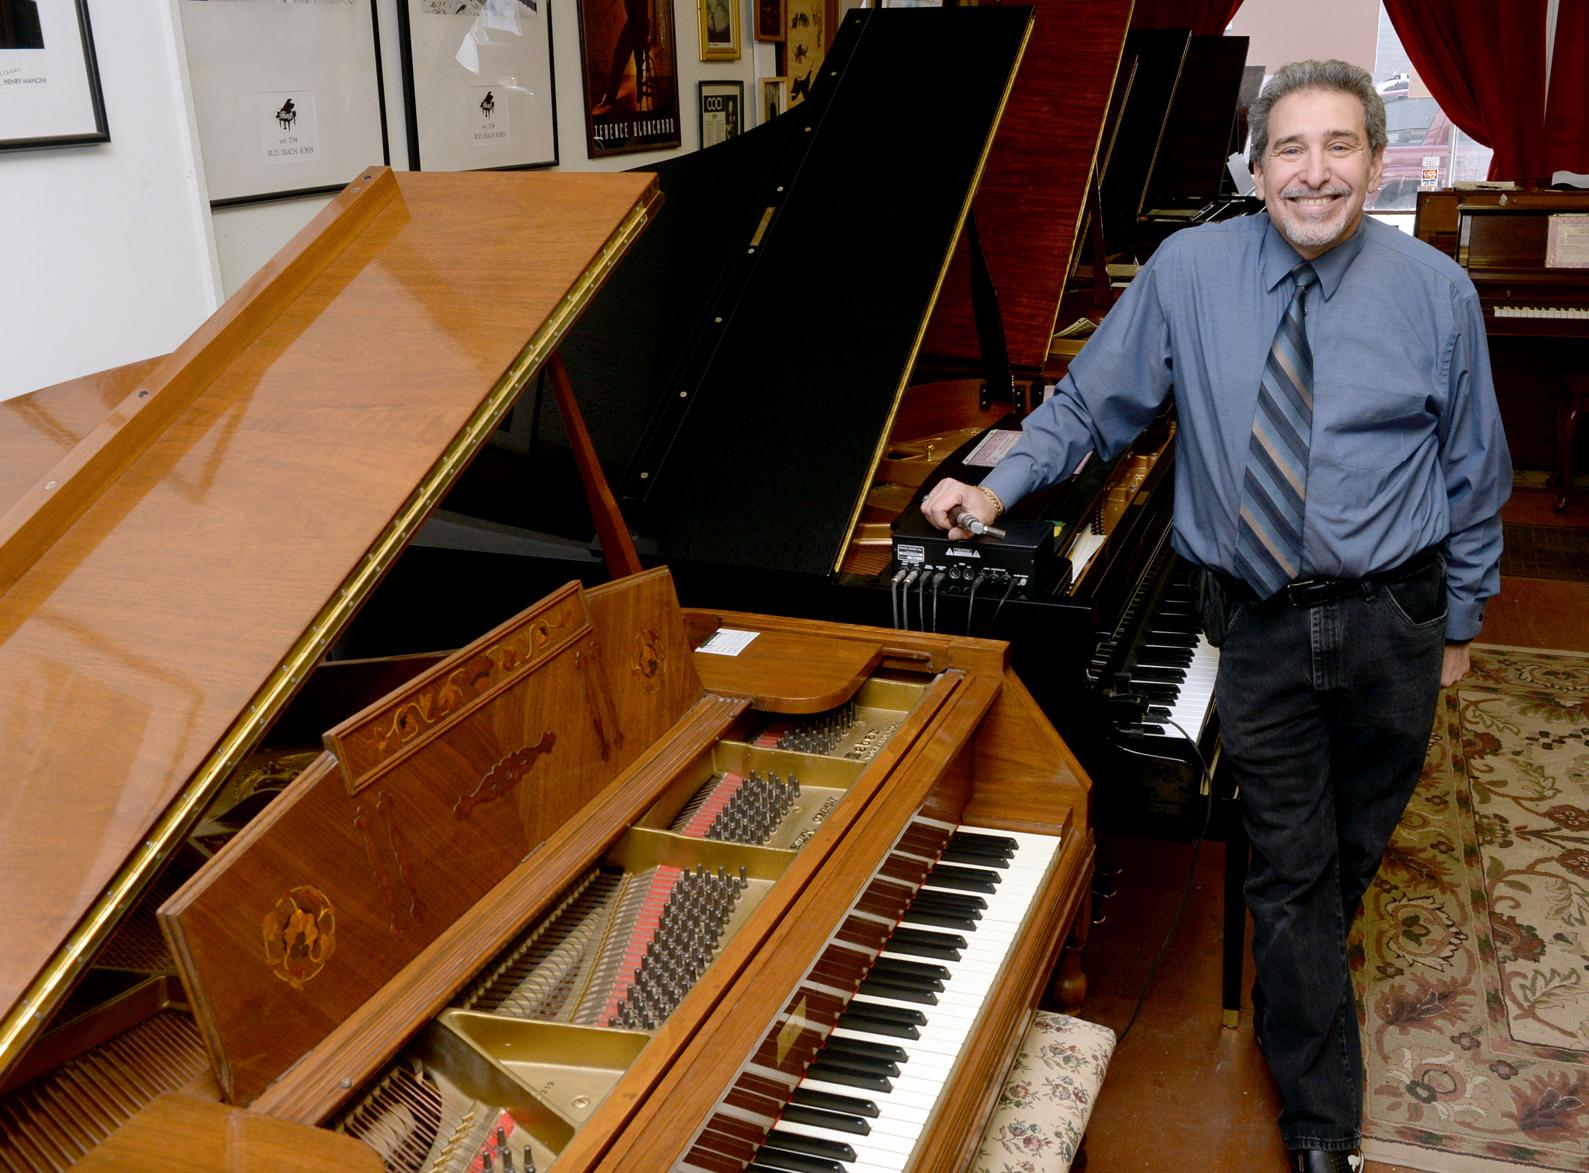 Evan Tublitz of Used Piano Center